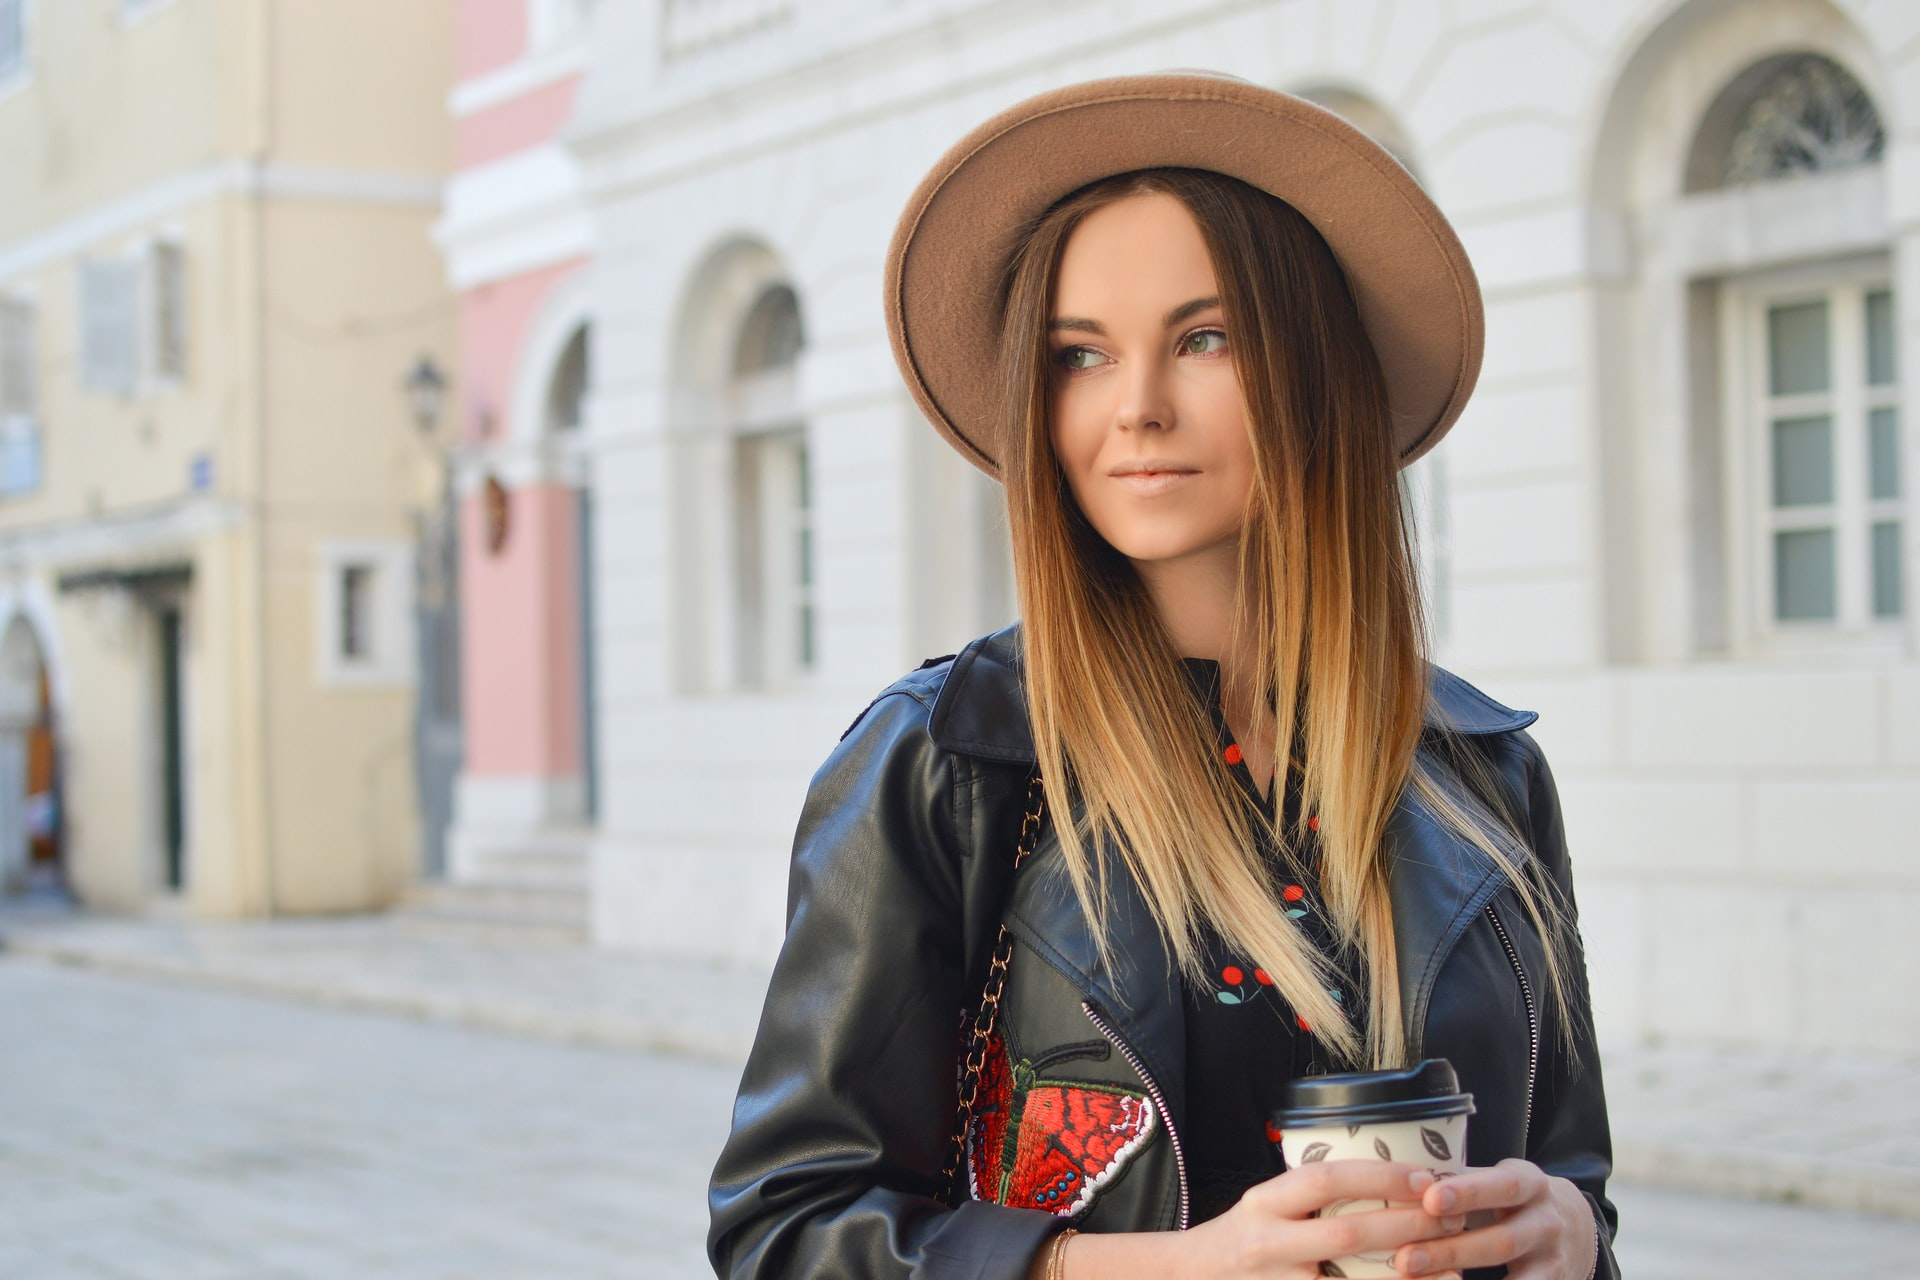 Russian stylish girl in hat